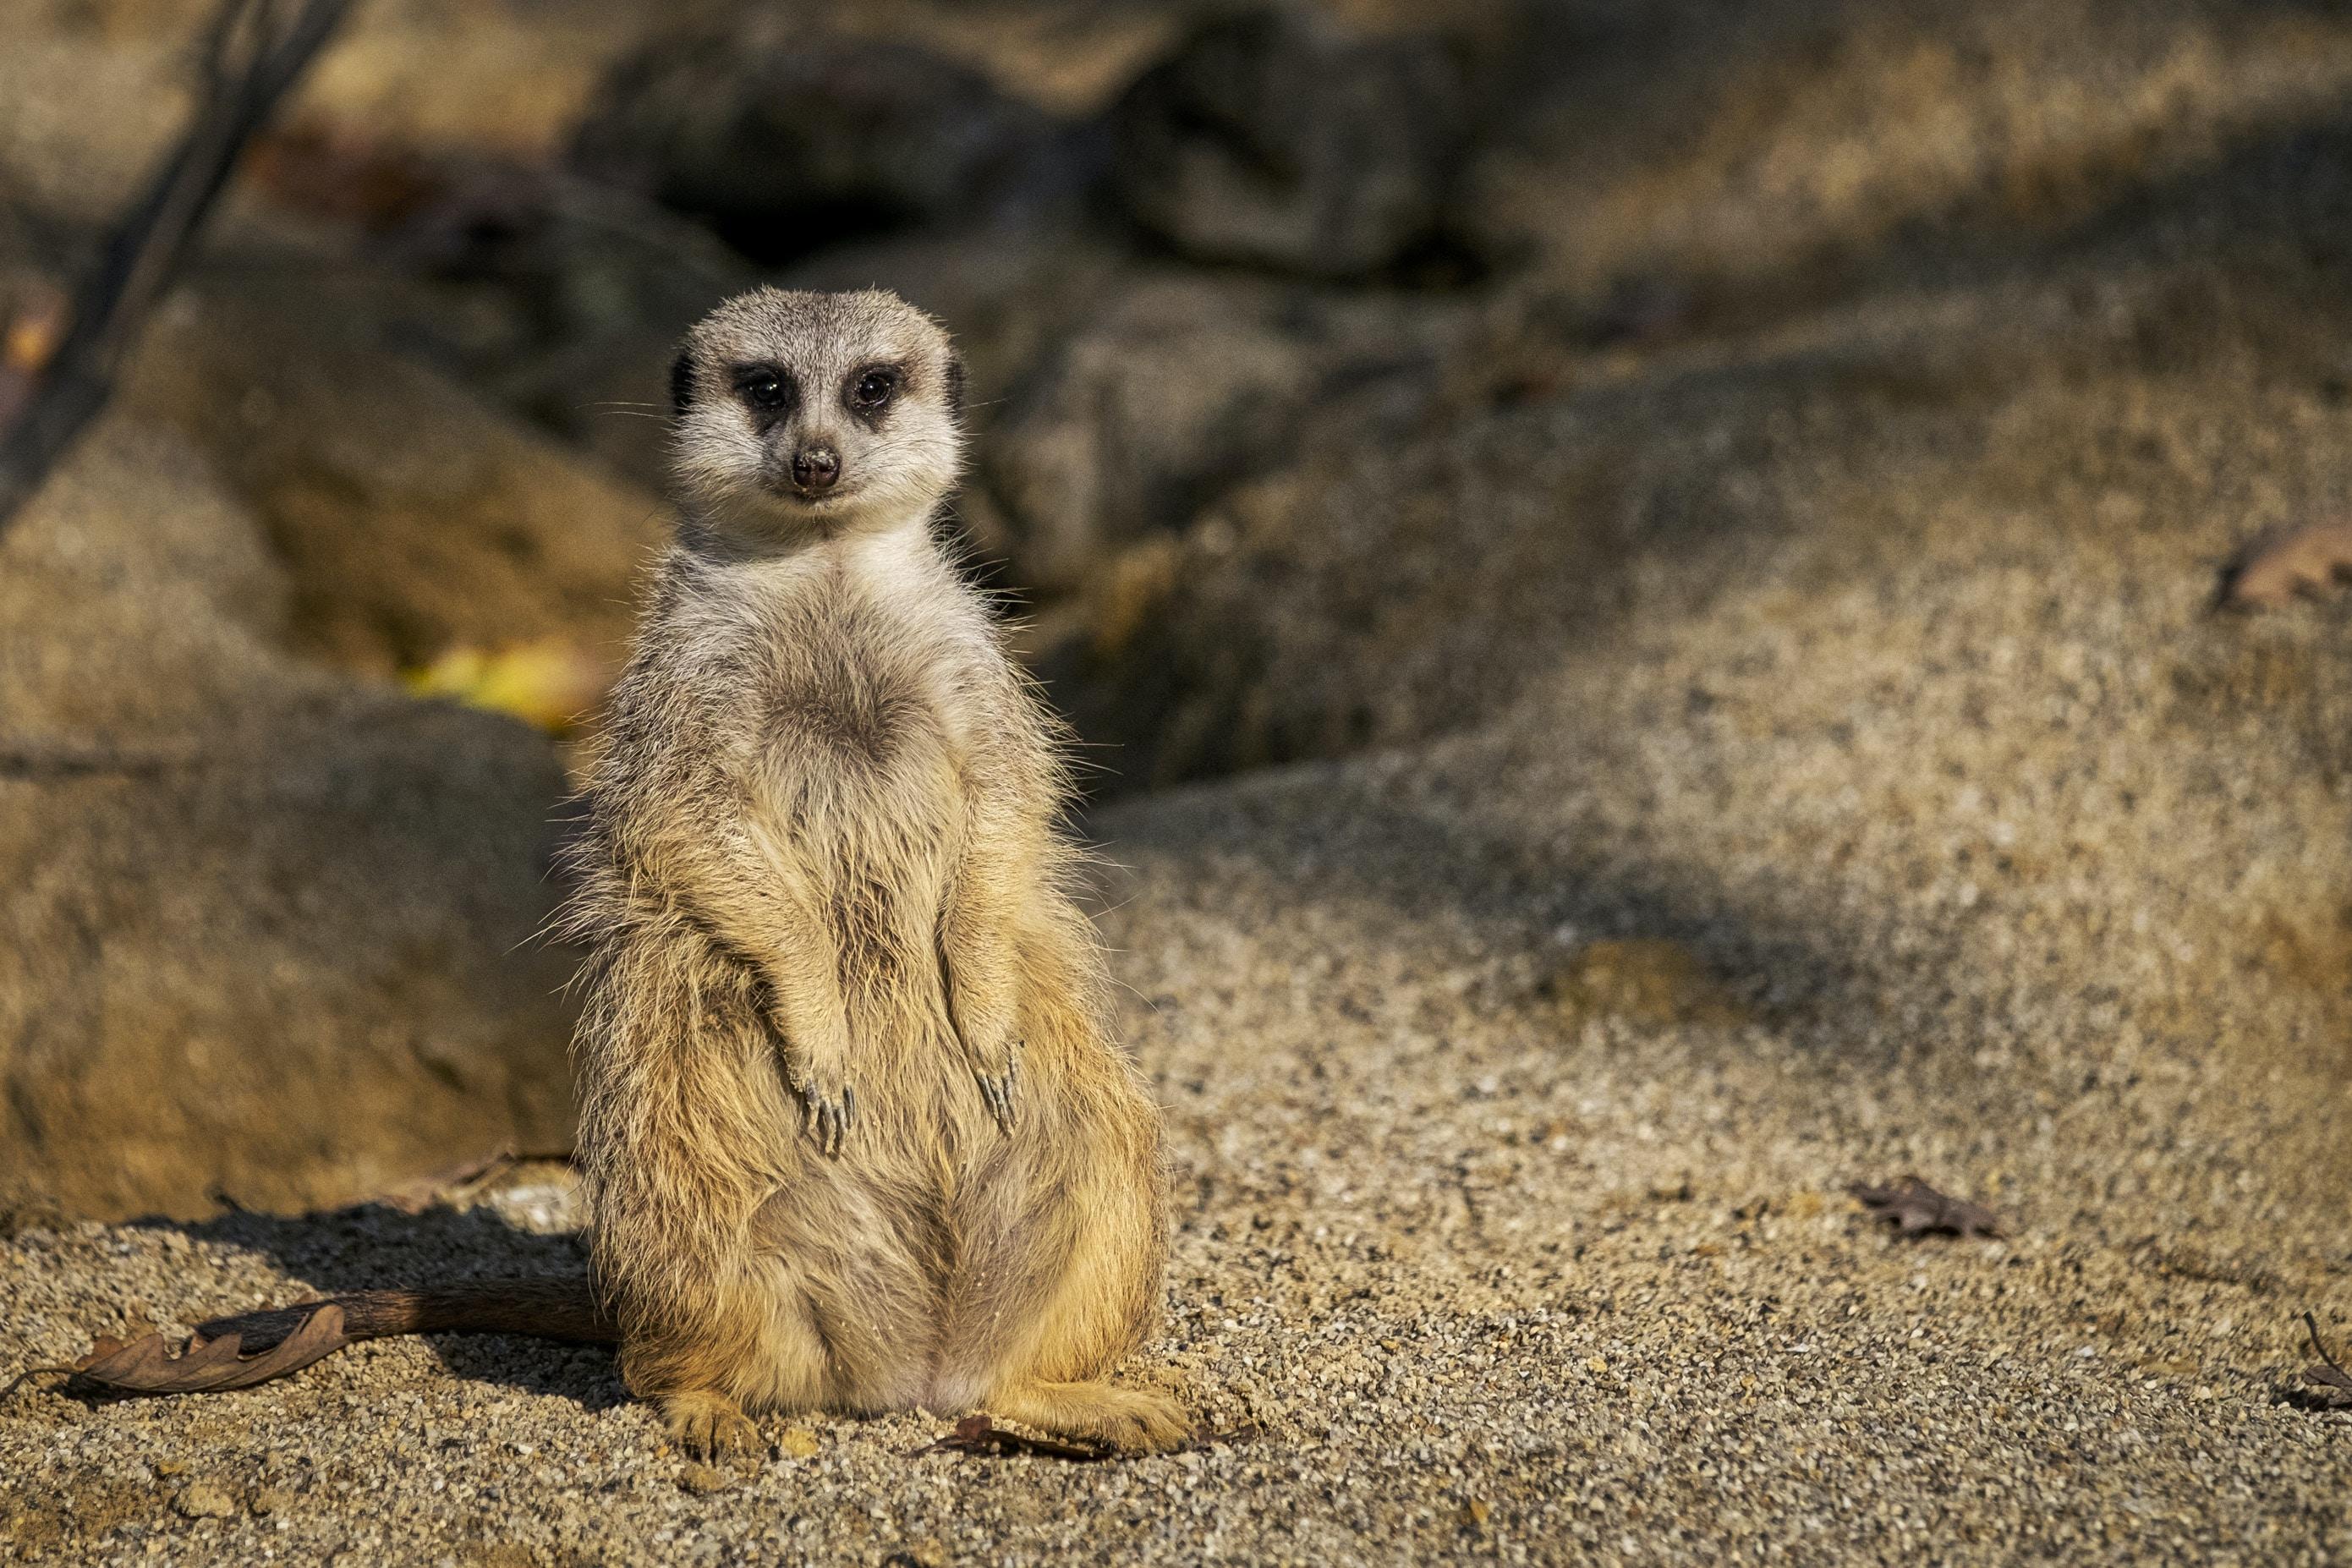 closeup photo of meerkat on sand